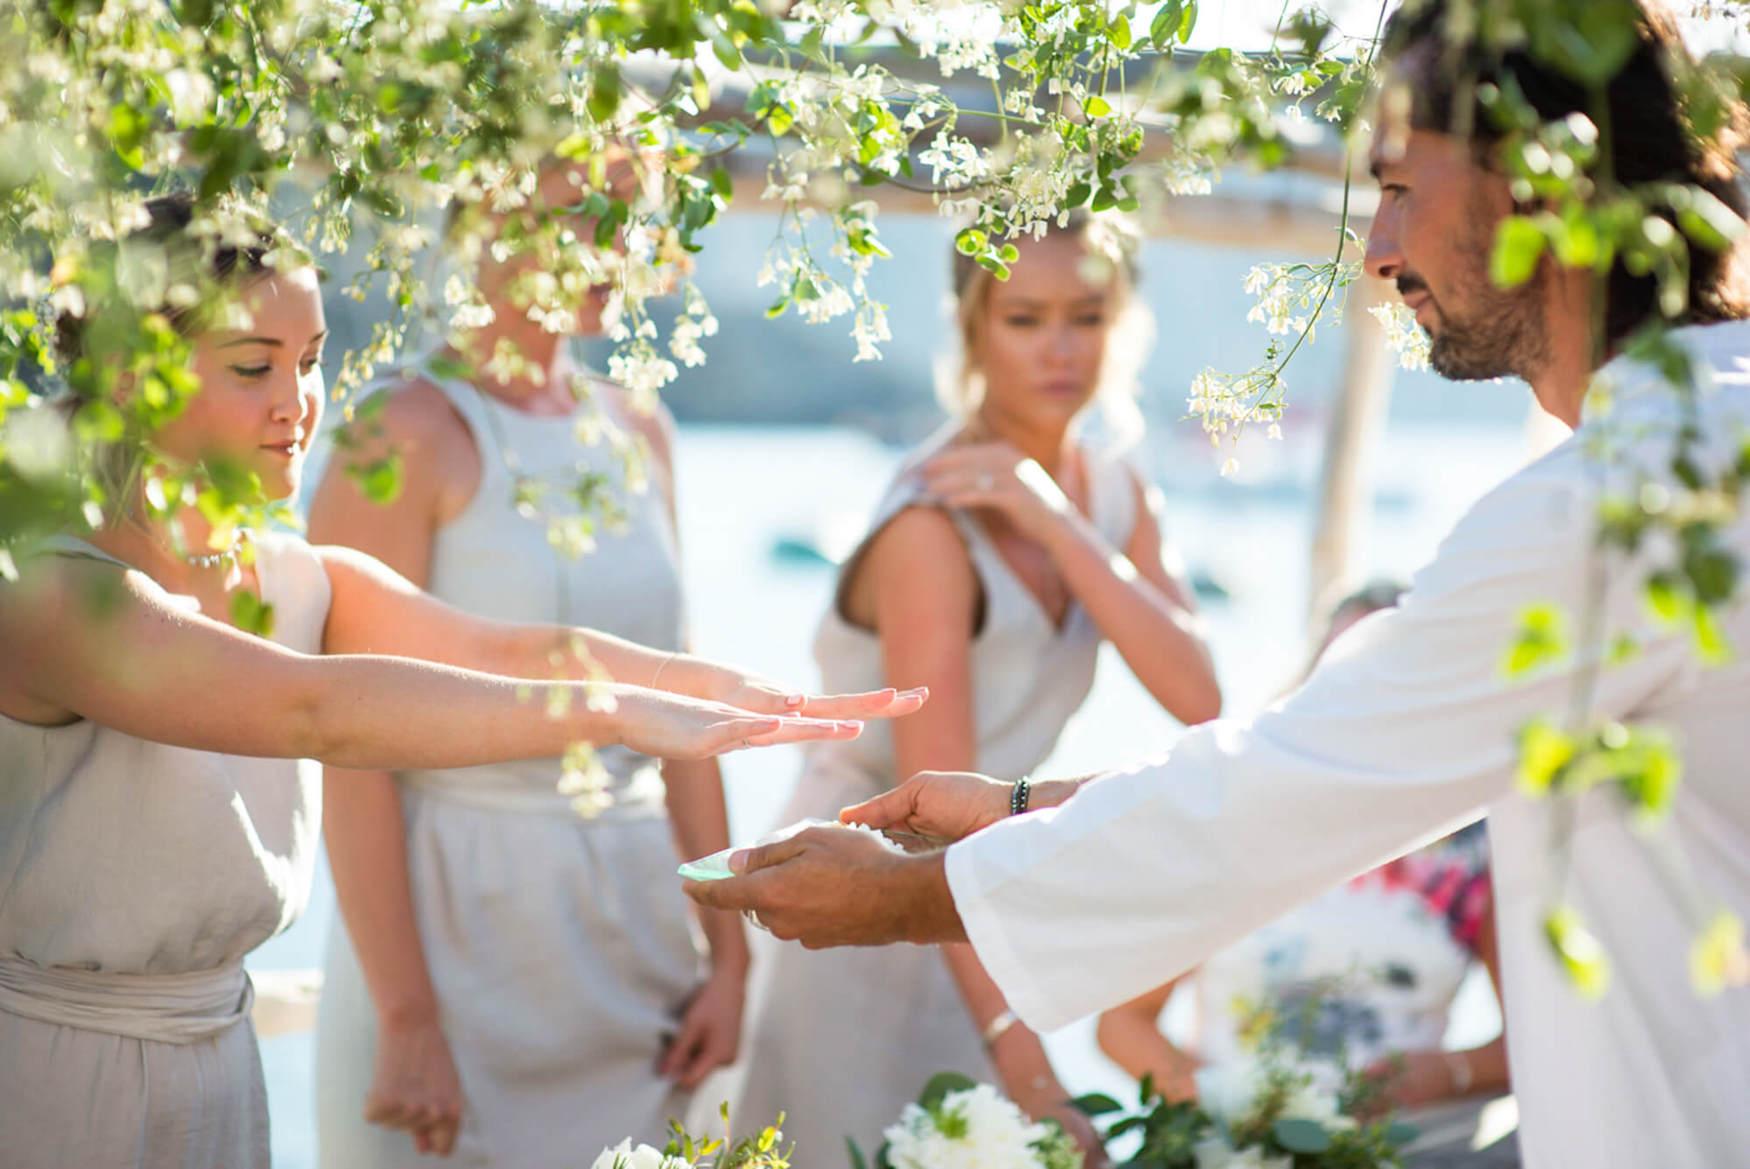 bride groom ring ceremony beach wedding seaside happy laughter elements benirras amanda wakeley